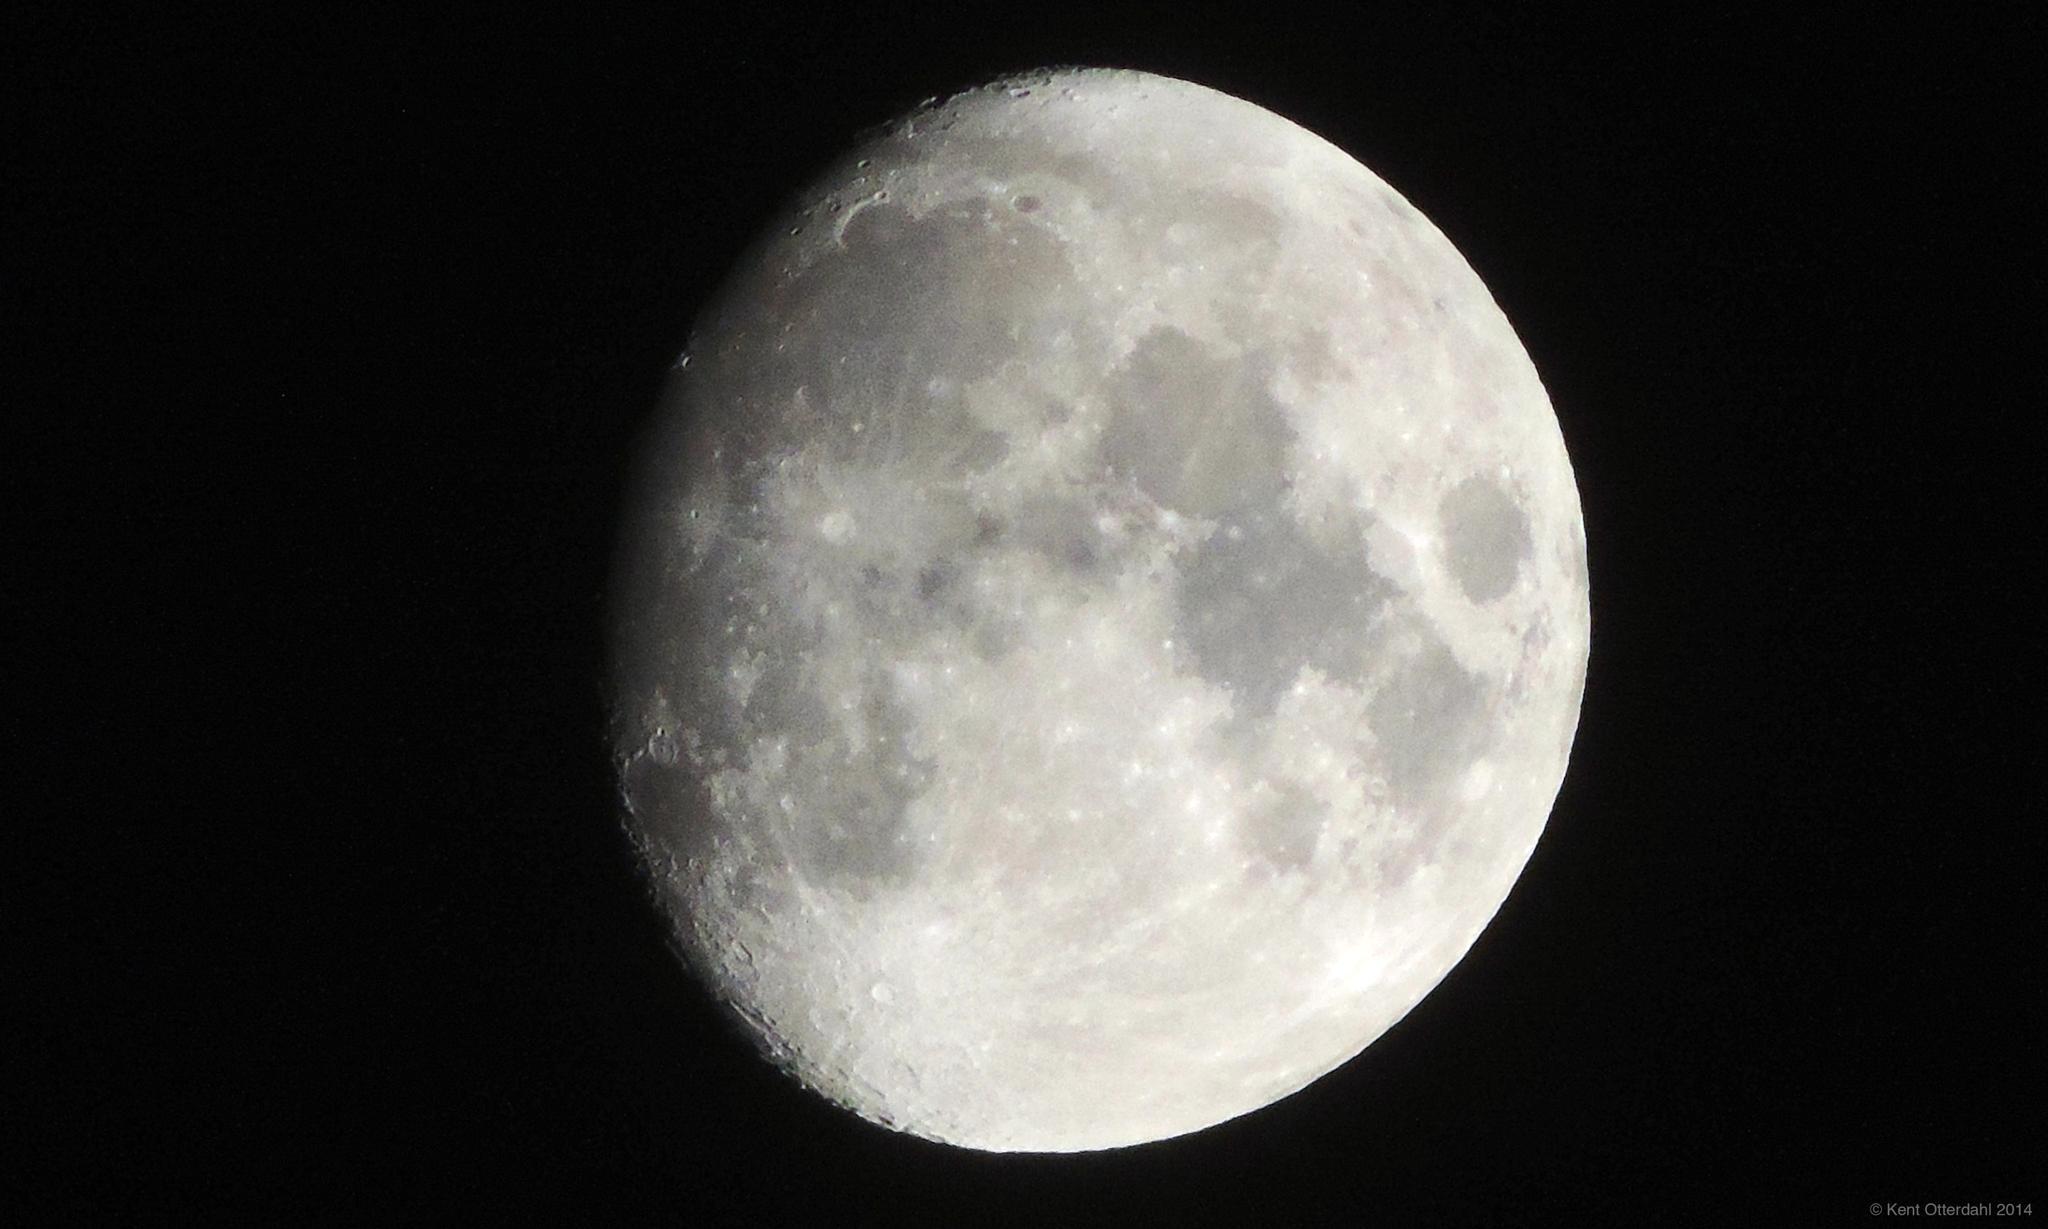 The Moon by kent.otterdahl